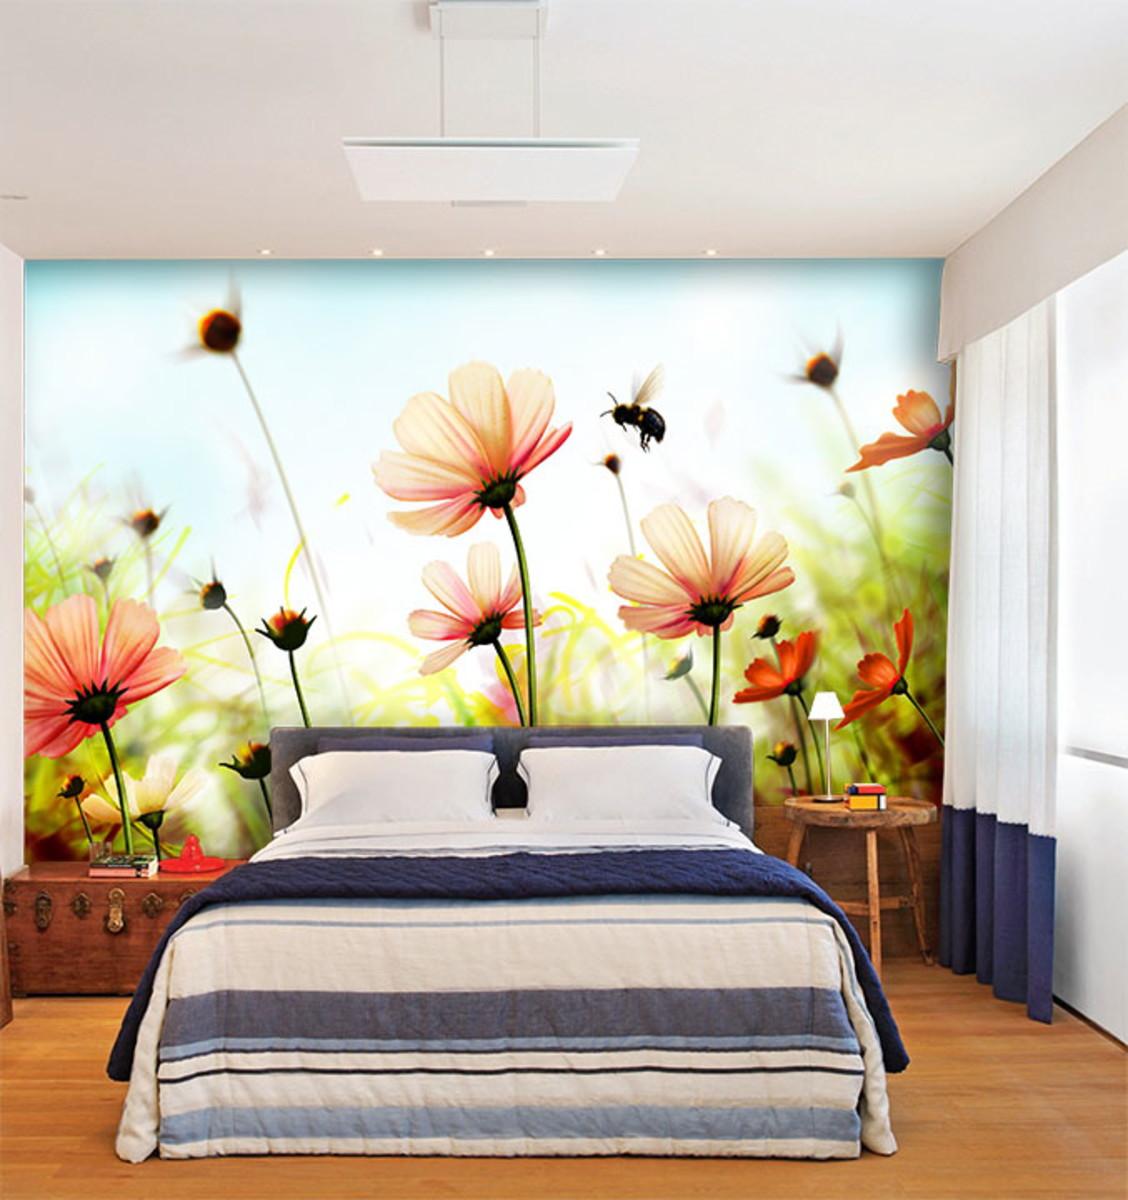 Papel de parede flores 0027 papel de parede 3d no elo7 - Papel adhesivo para paredes ...